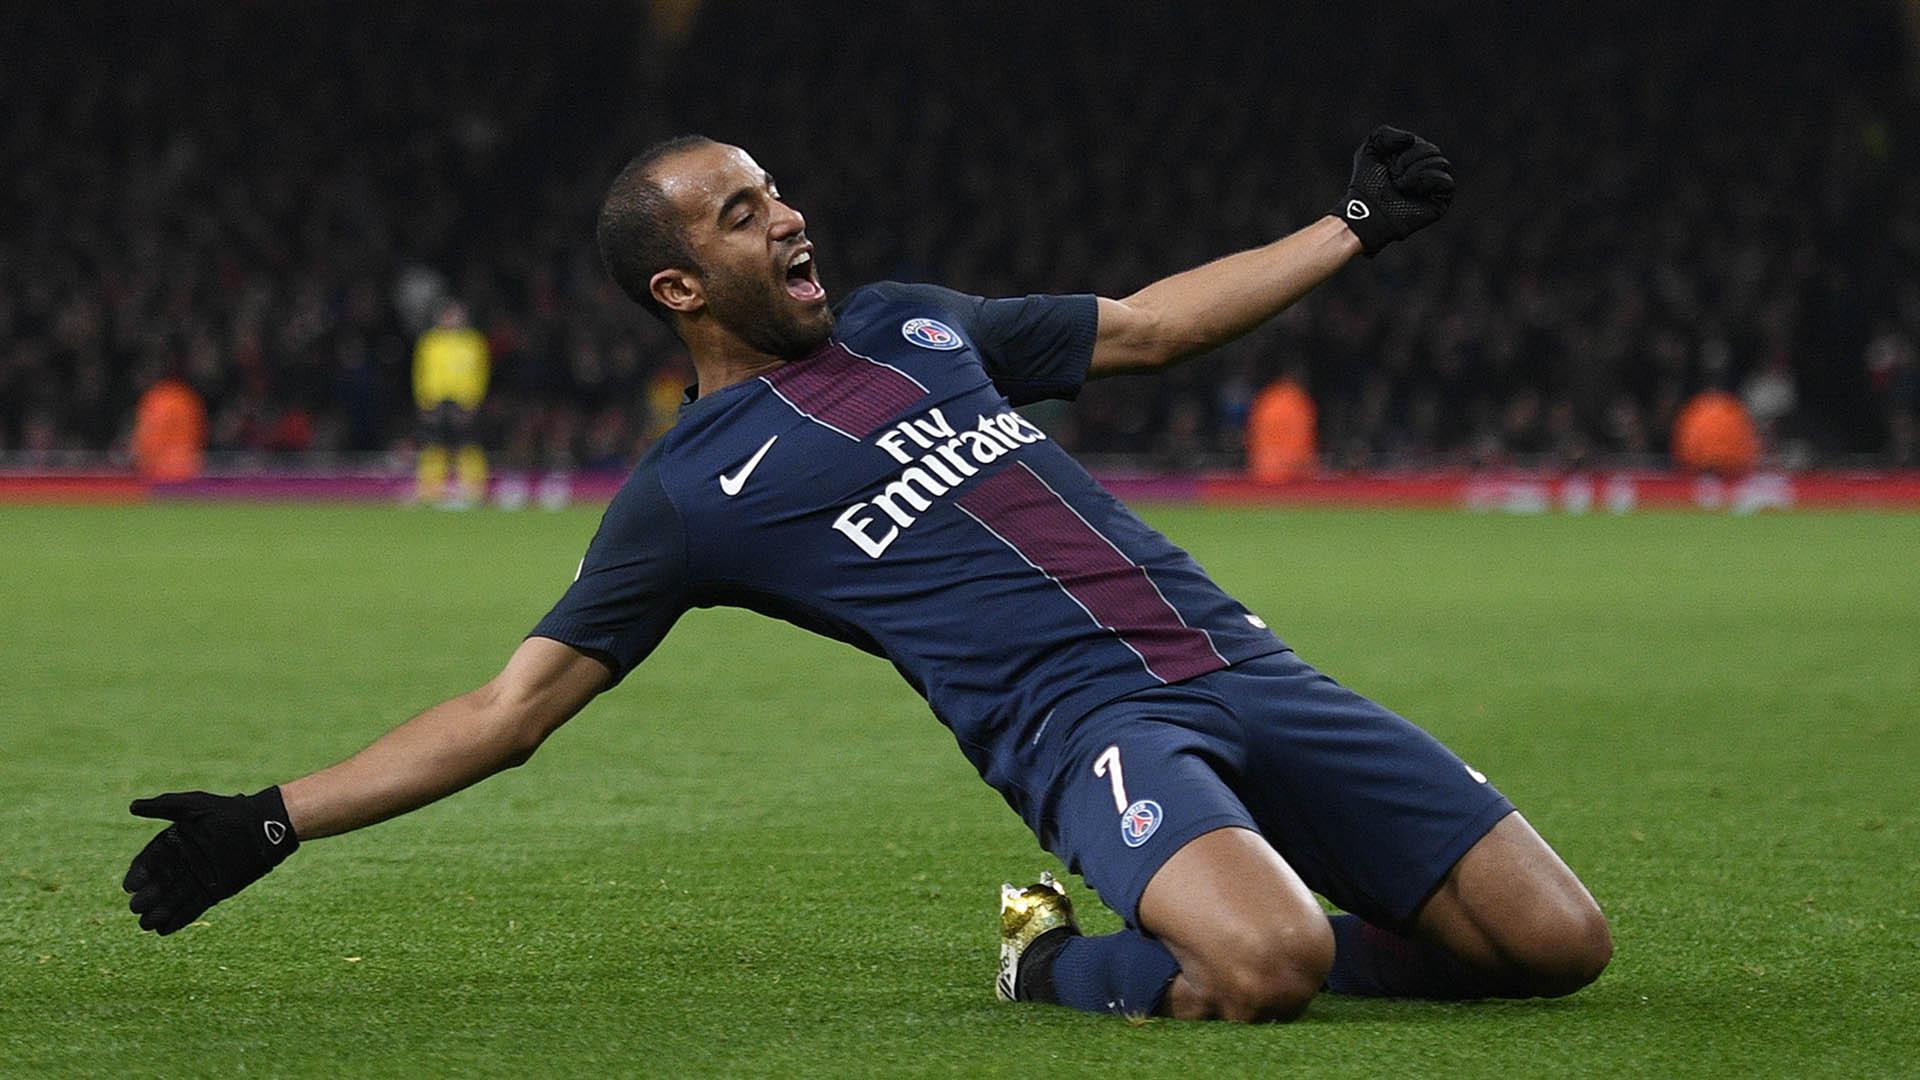 Gelandang Paris Saint-Germain, Lucas Moura (23/11/2016). (AFP/Justin Tallis)